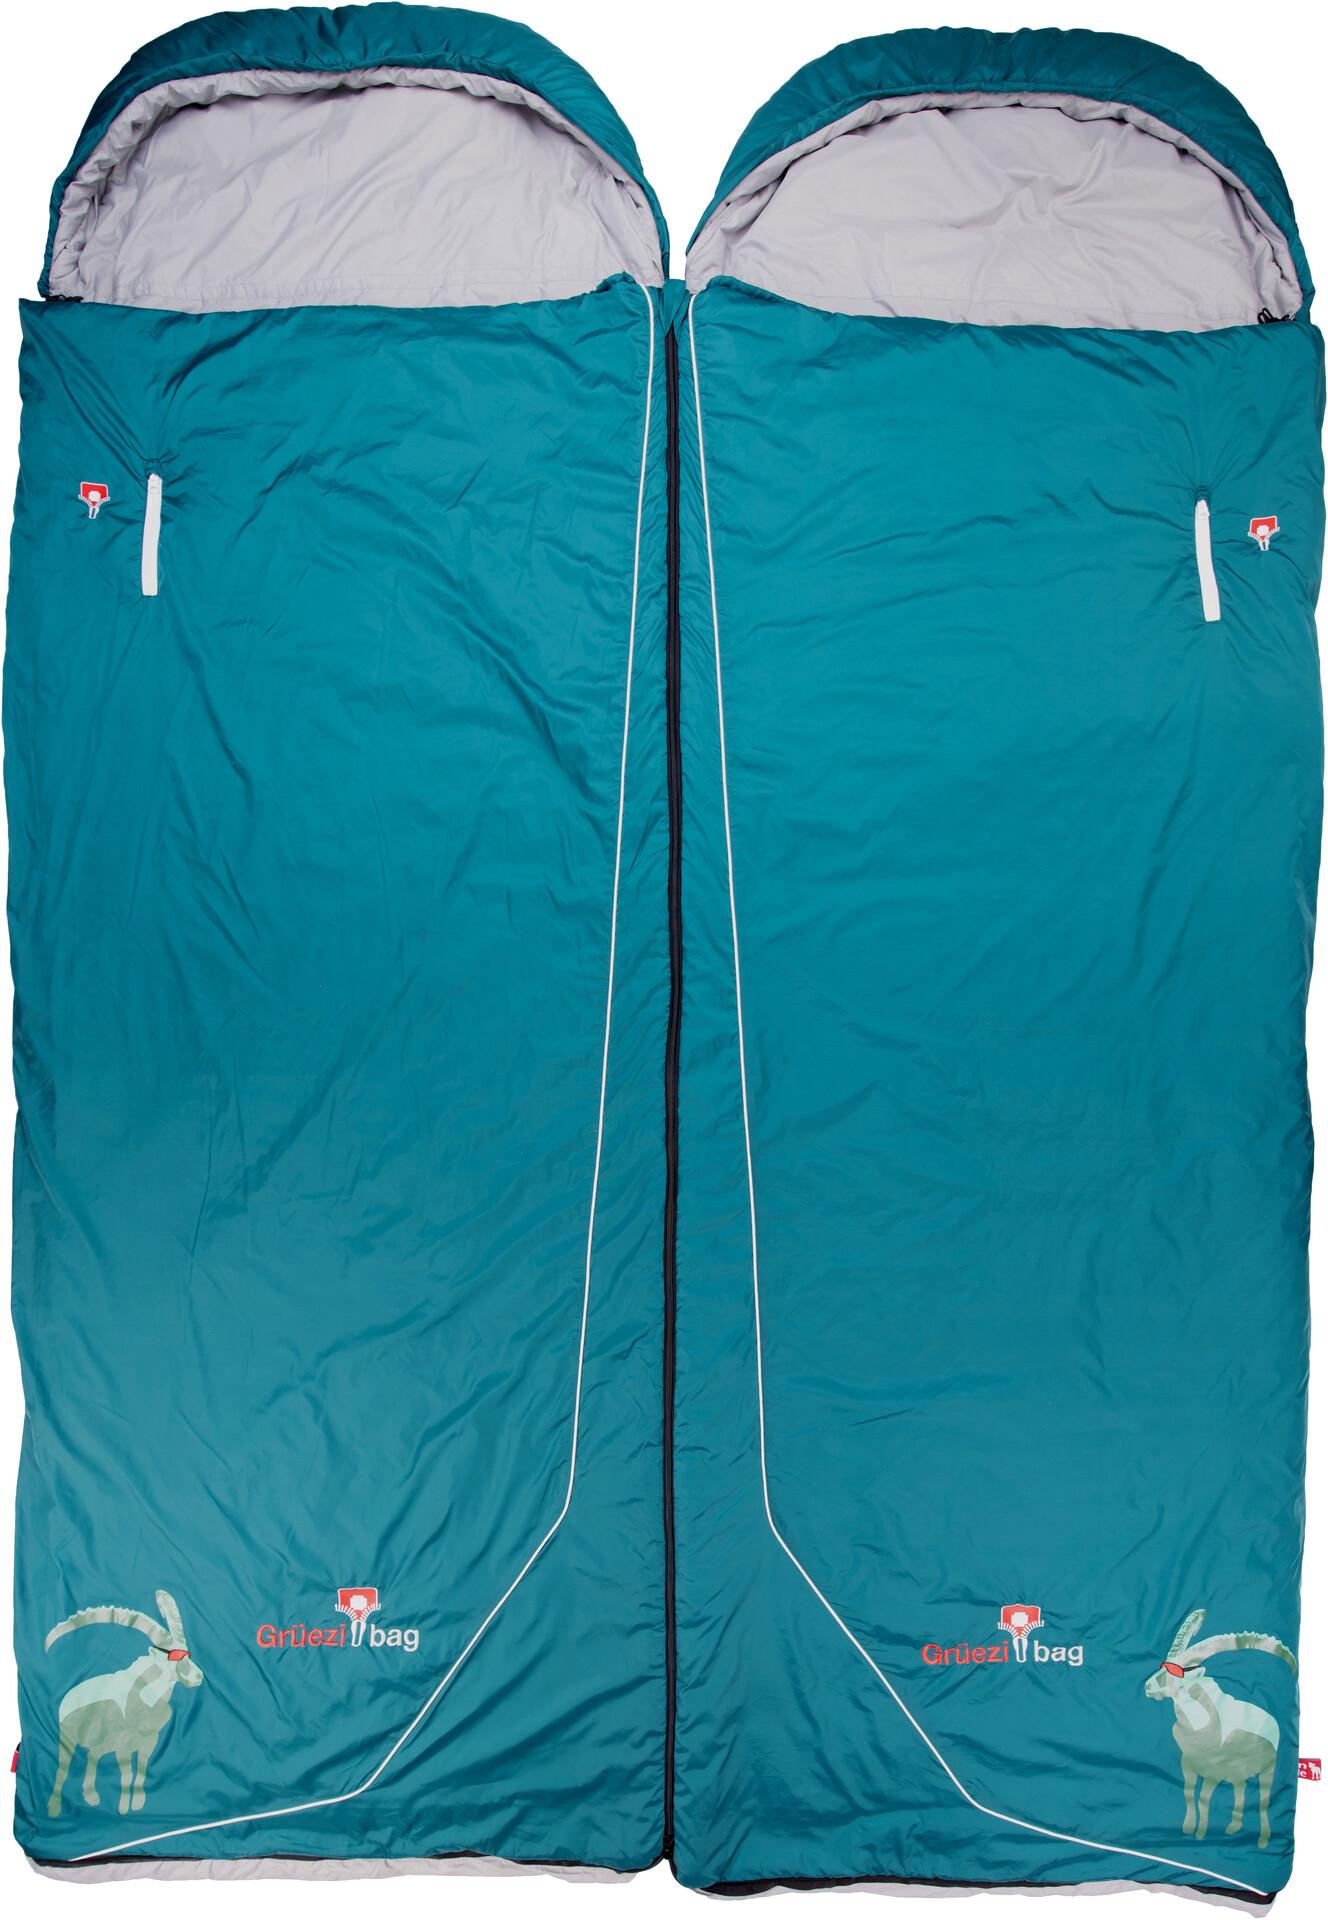 Grüezi Bag Biopod Wool Goas Comfort Sleeping Bag dark petrol